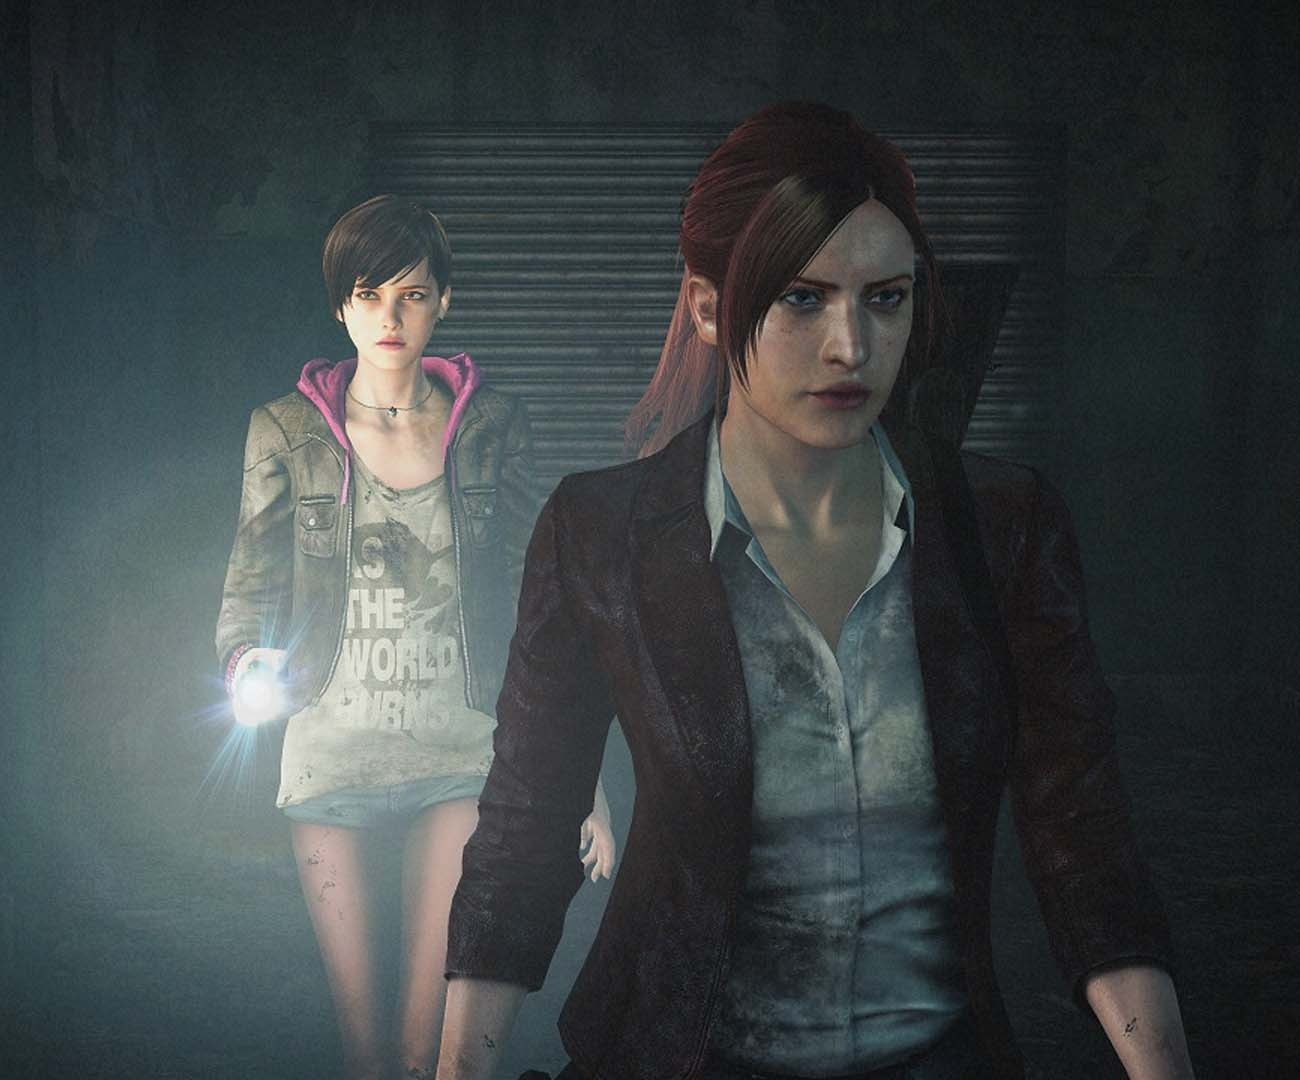 Resident Evil Revelations 3 powstaje i skupia się na małej konsolce